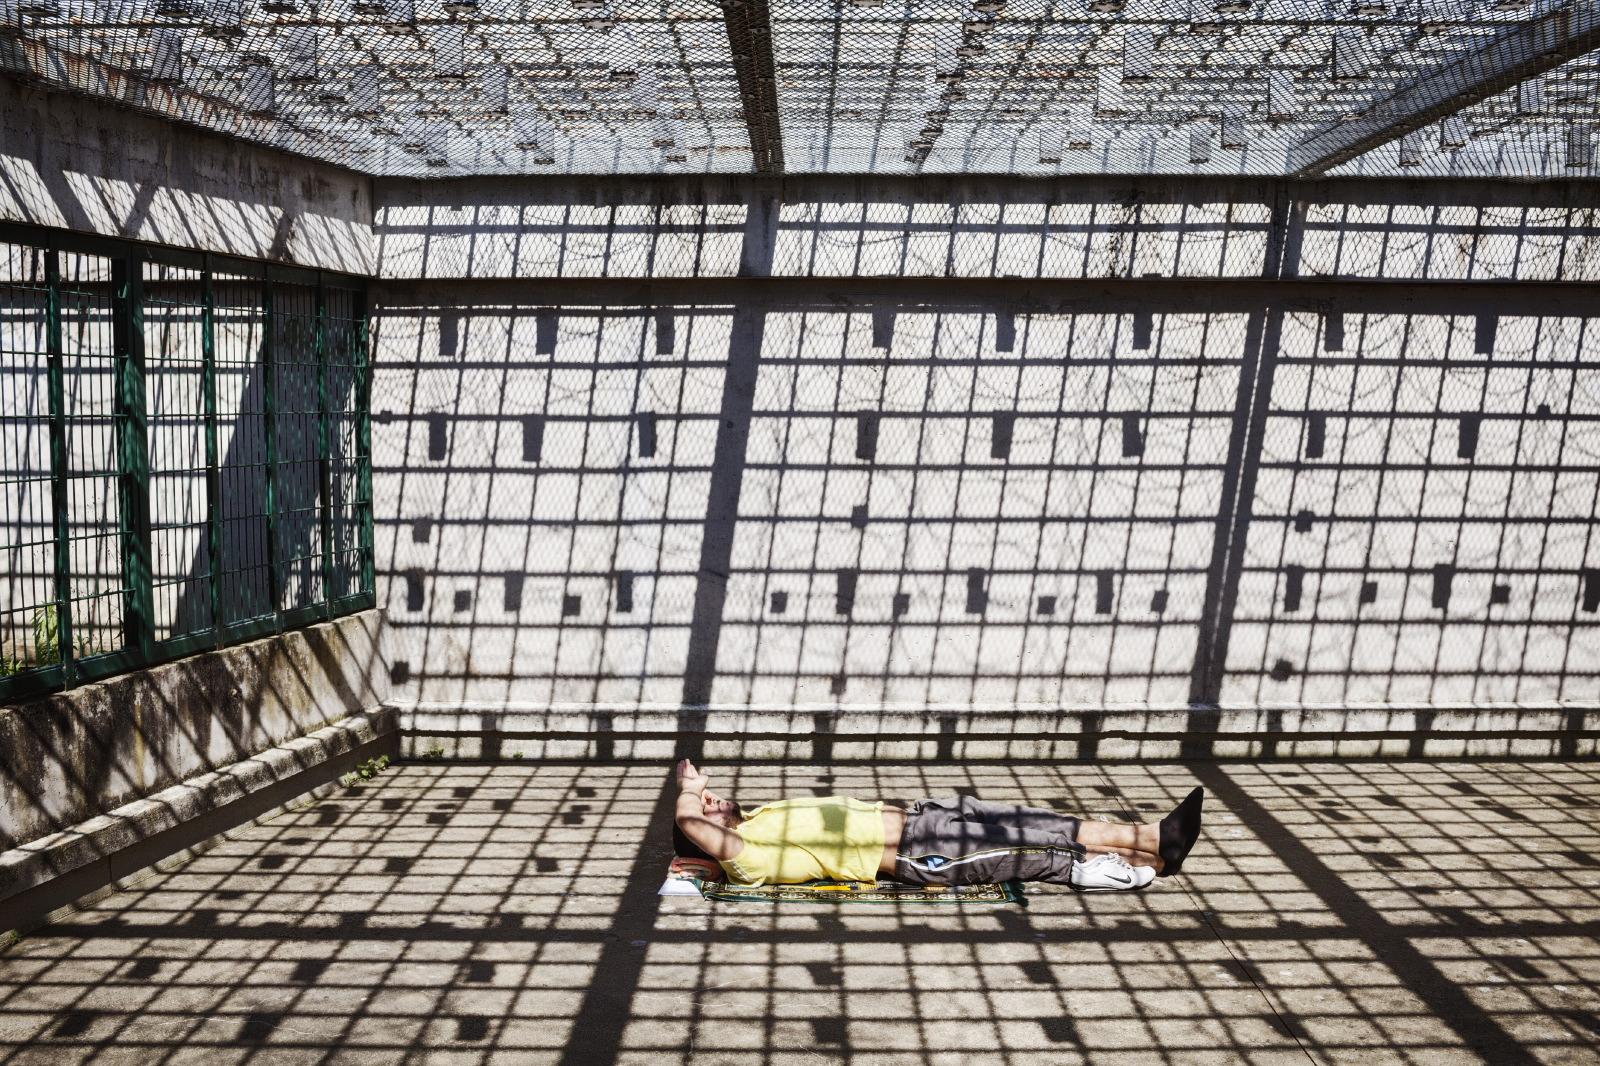 Prisons-Korganow-3